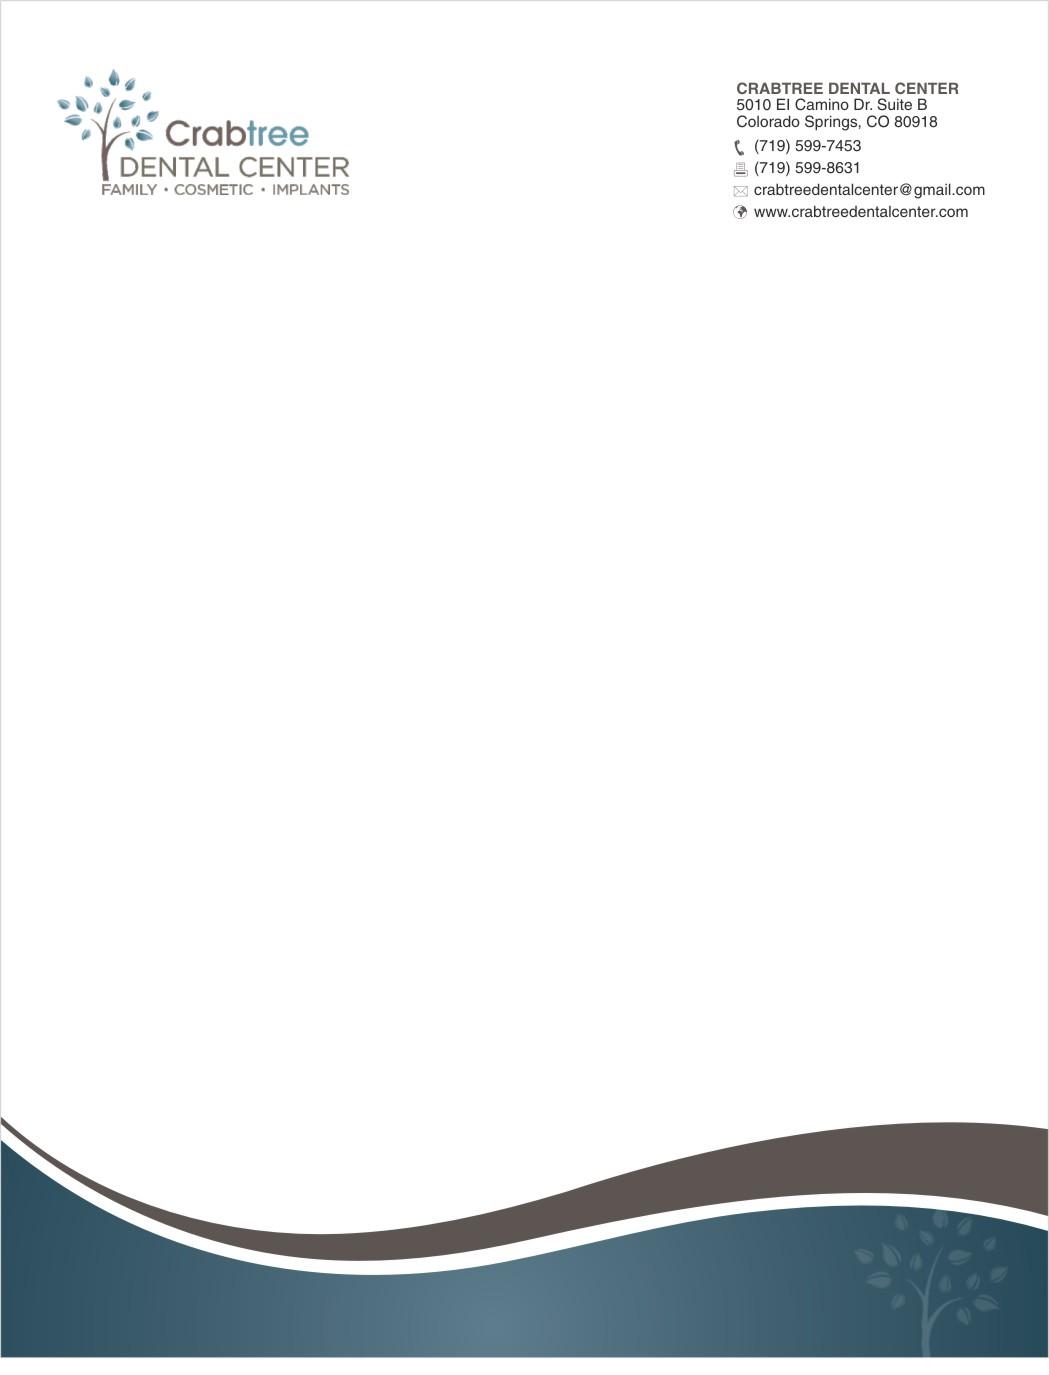 Elegant, Playful Letterhead Design for David Crabtree by sanjeev ...